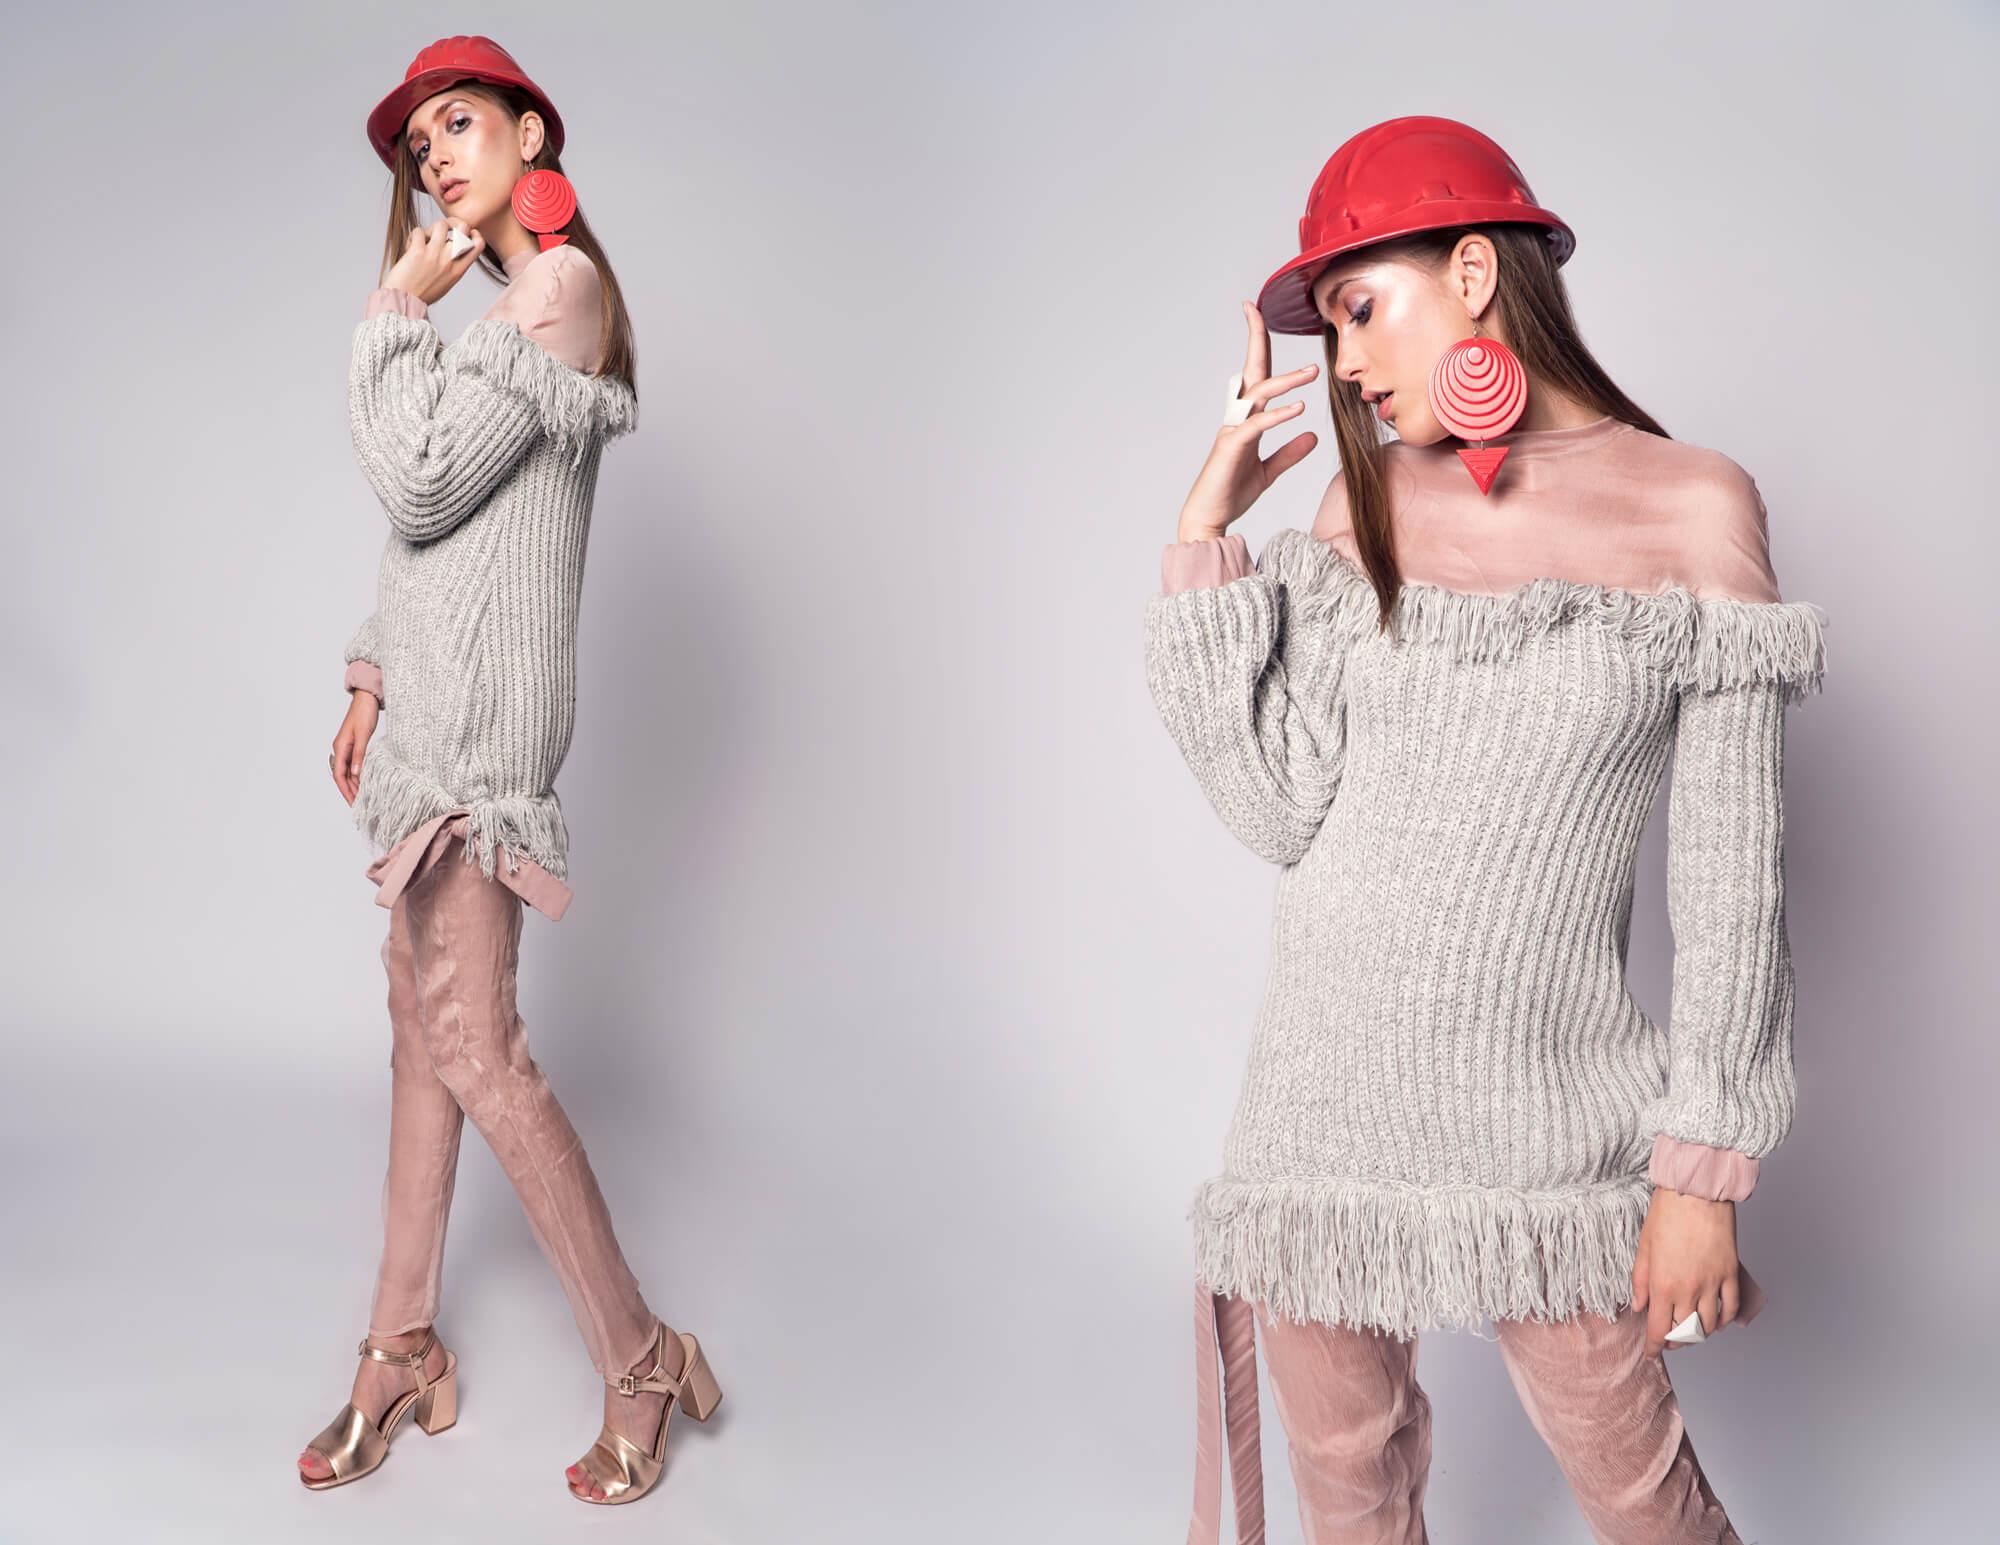 fotograf bucuresti crina popescu fashion amazon studio.jpg